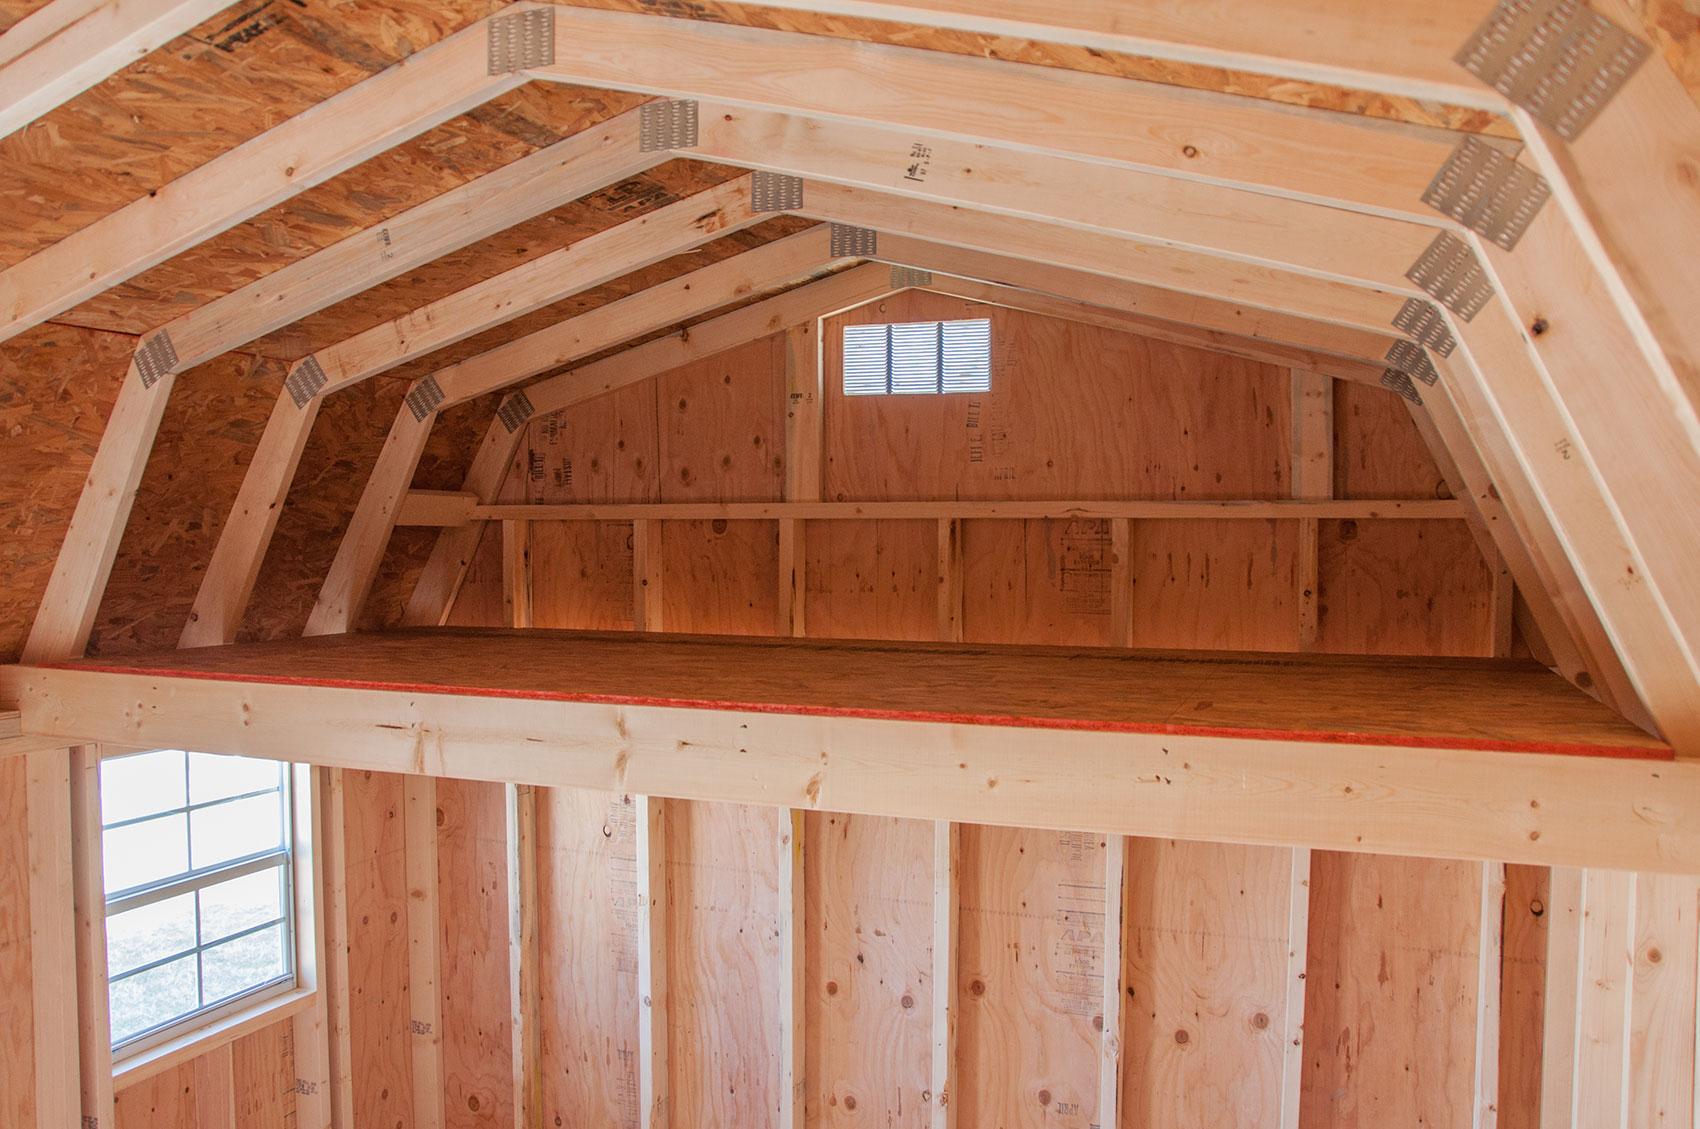 LakeSide Cabins & Sheds Loft Upgrade Option - Wooden ...